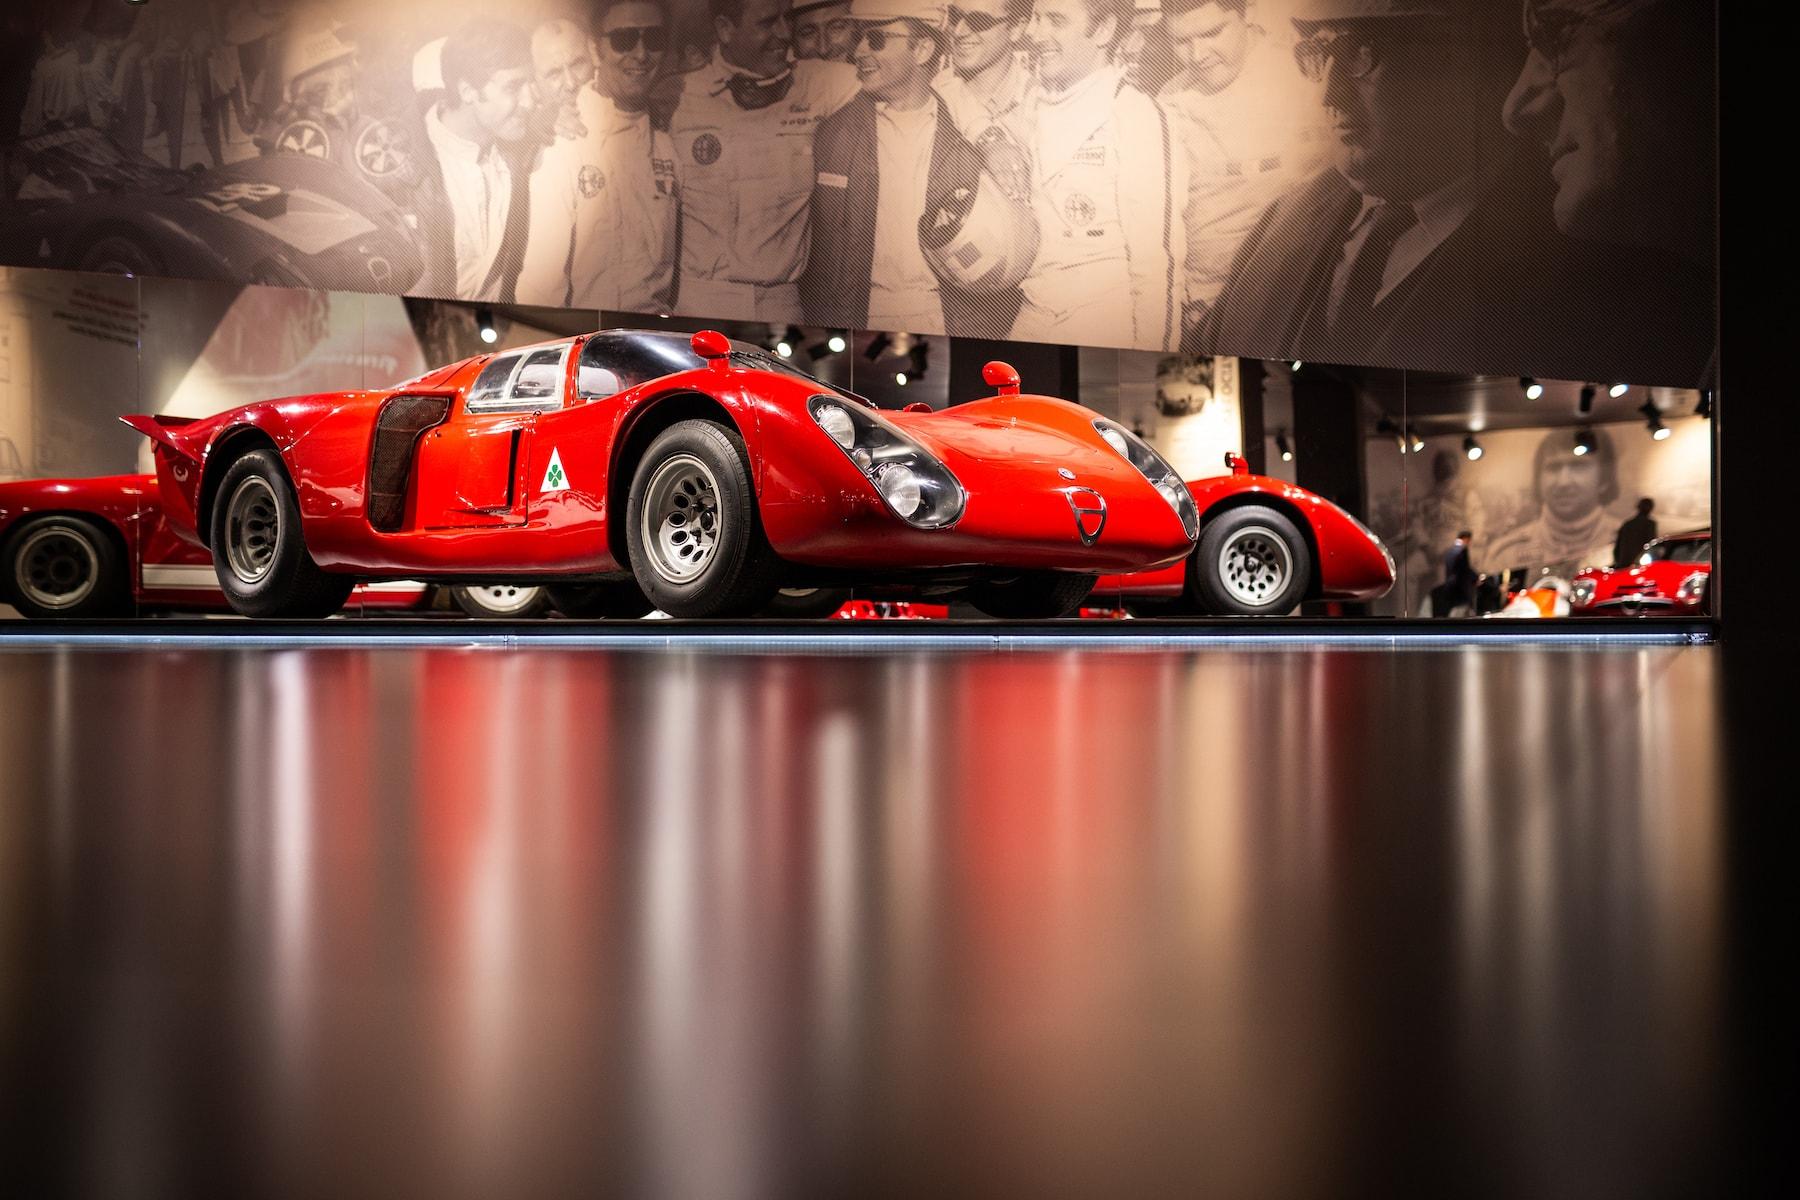 2019 Alfa Romeo at Museo Storico | 2019 Italian GP 11.jpg